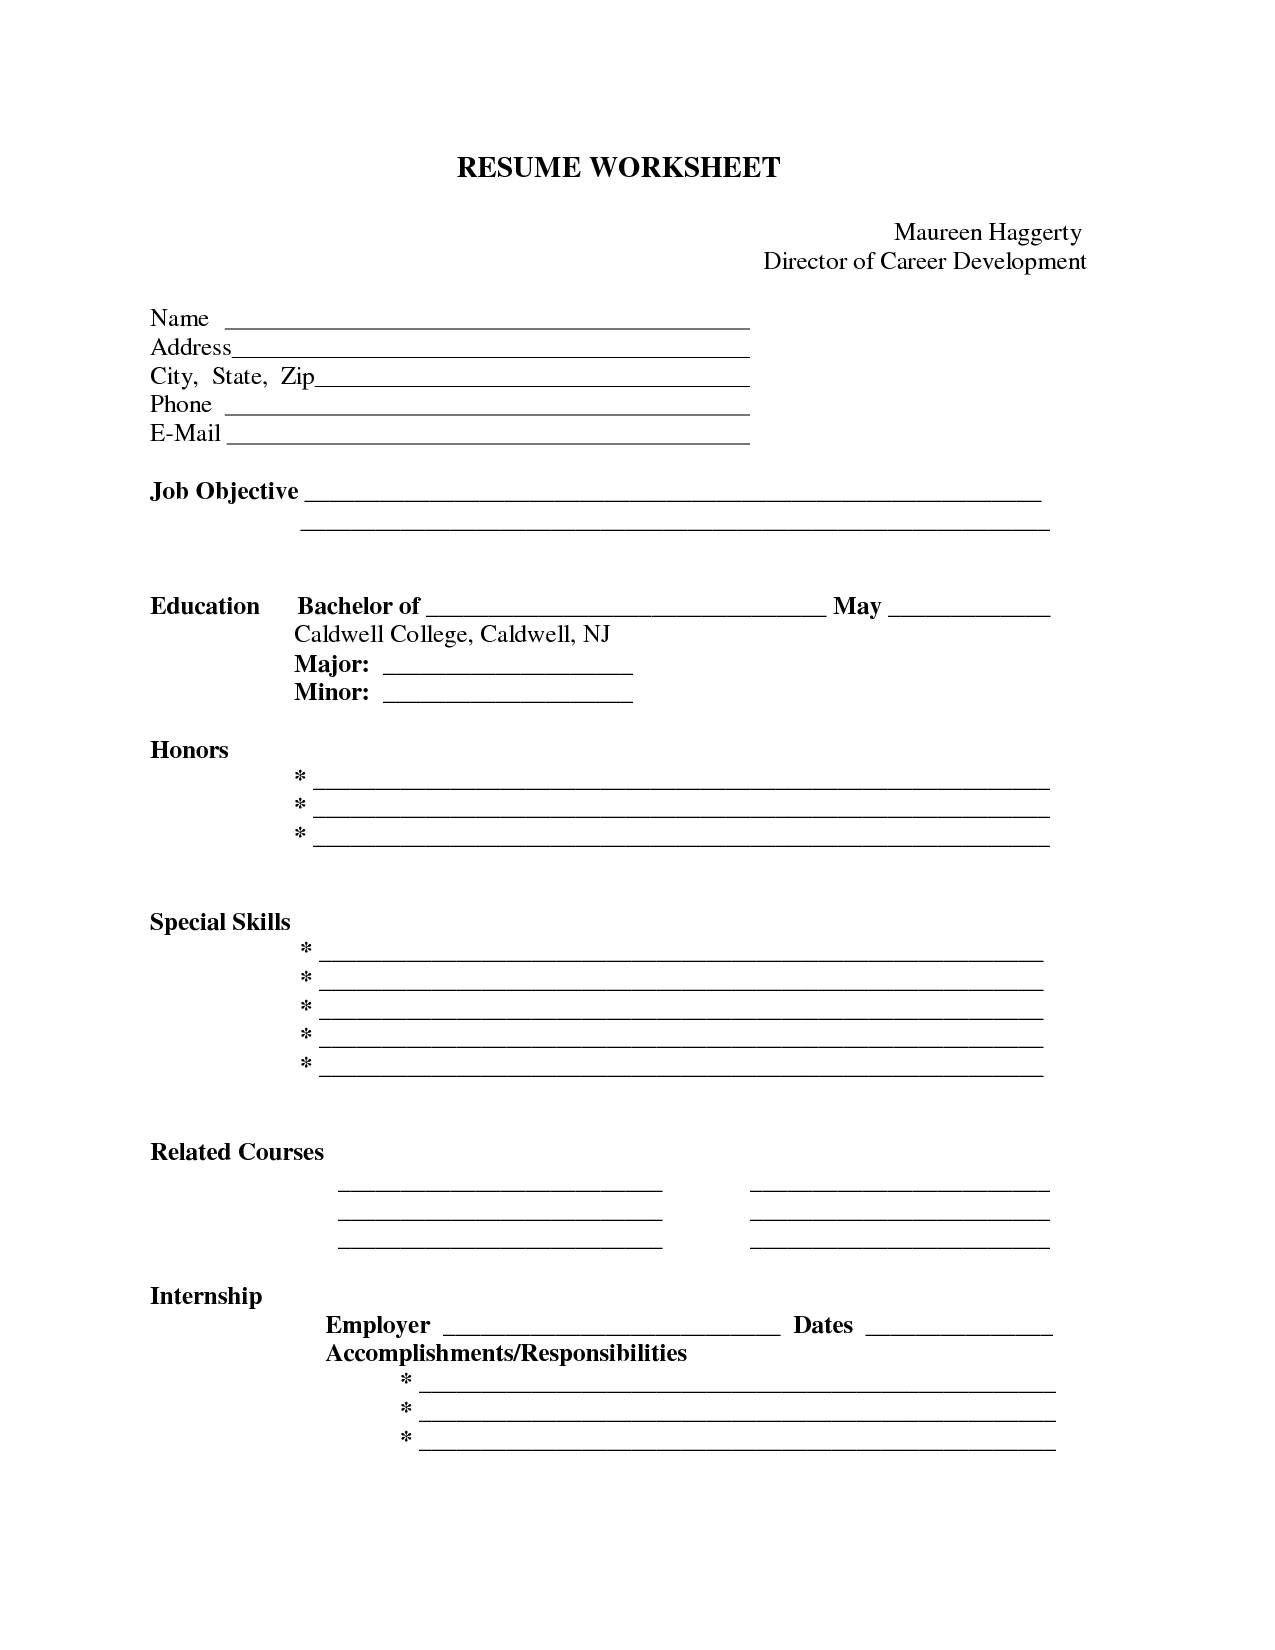 Sample Blank Resume forms to Print Free Printable Resume Builder - Http://www.resumecareer.info/free ...